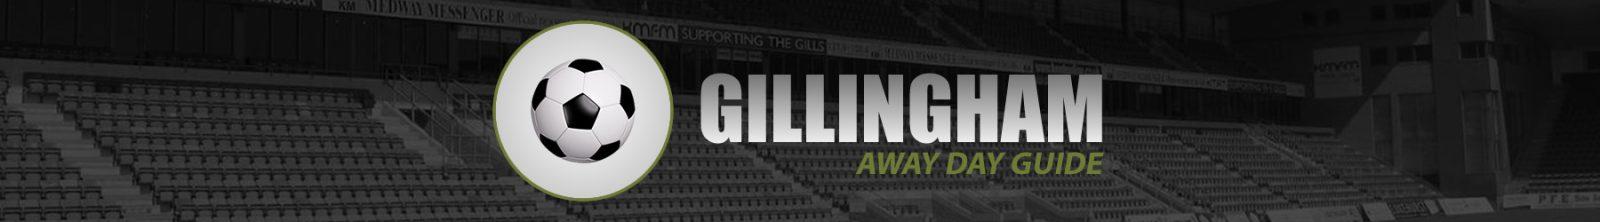 Gillingham Away